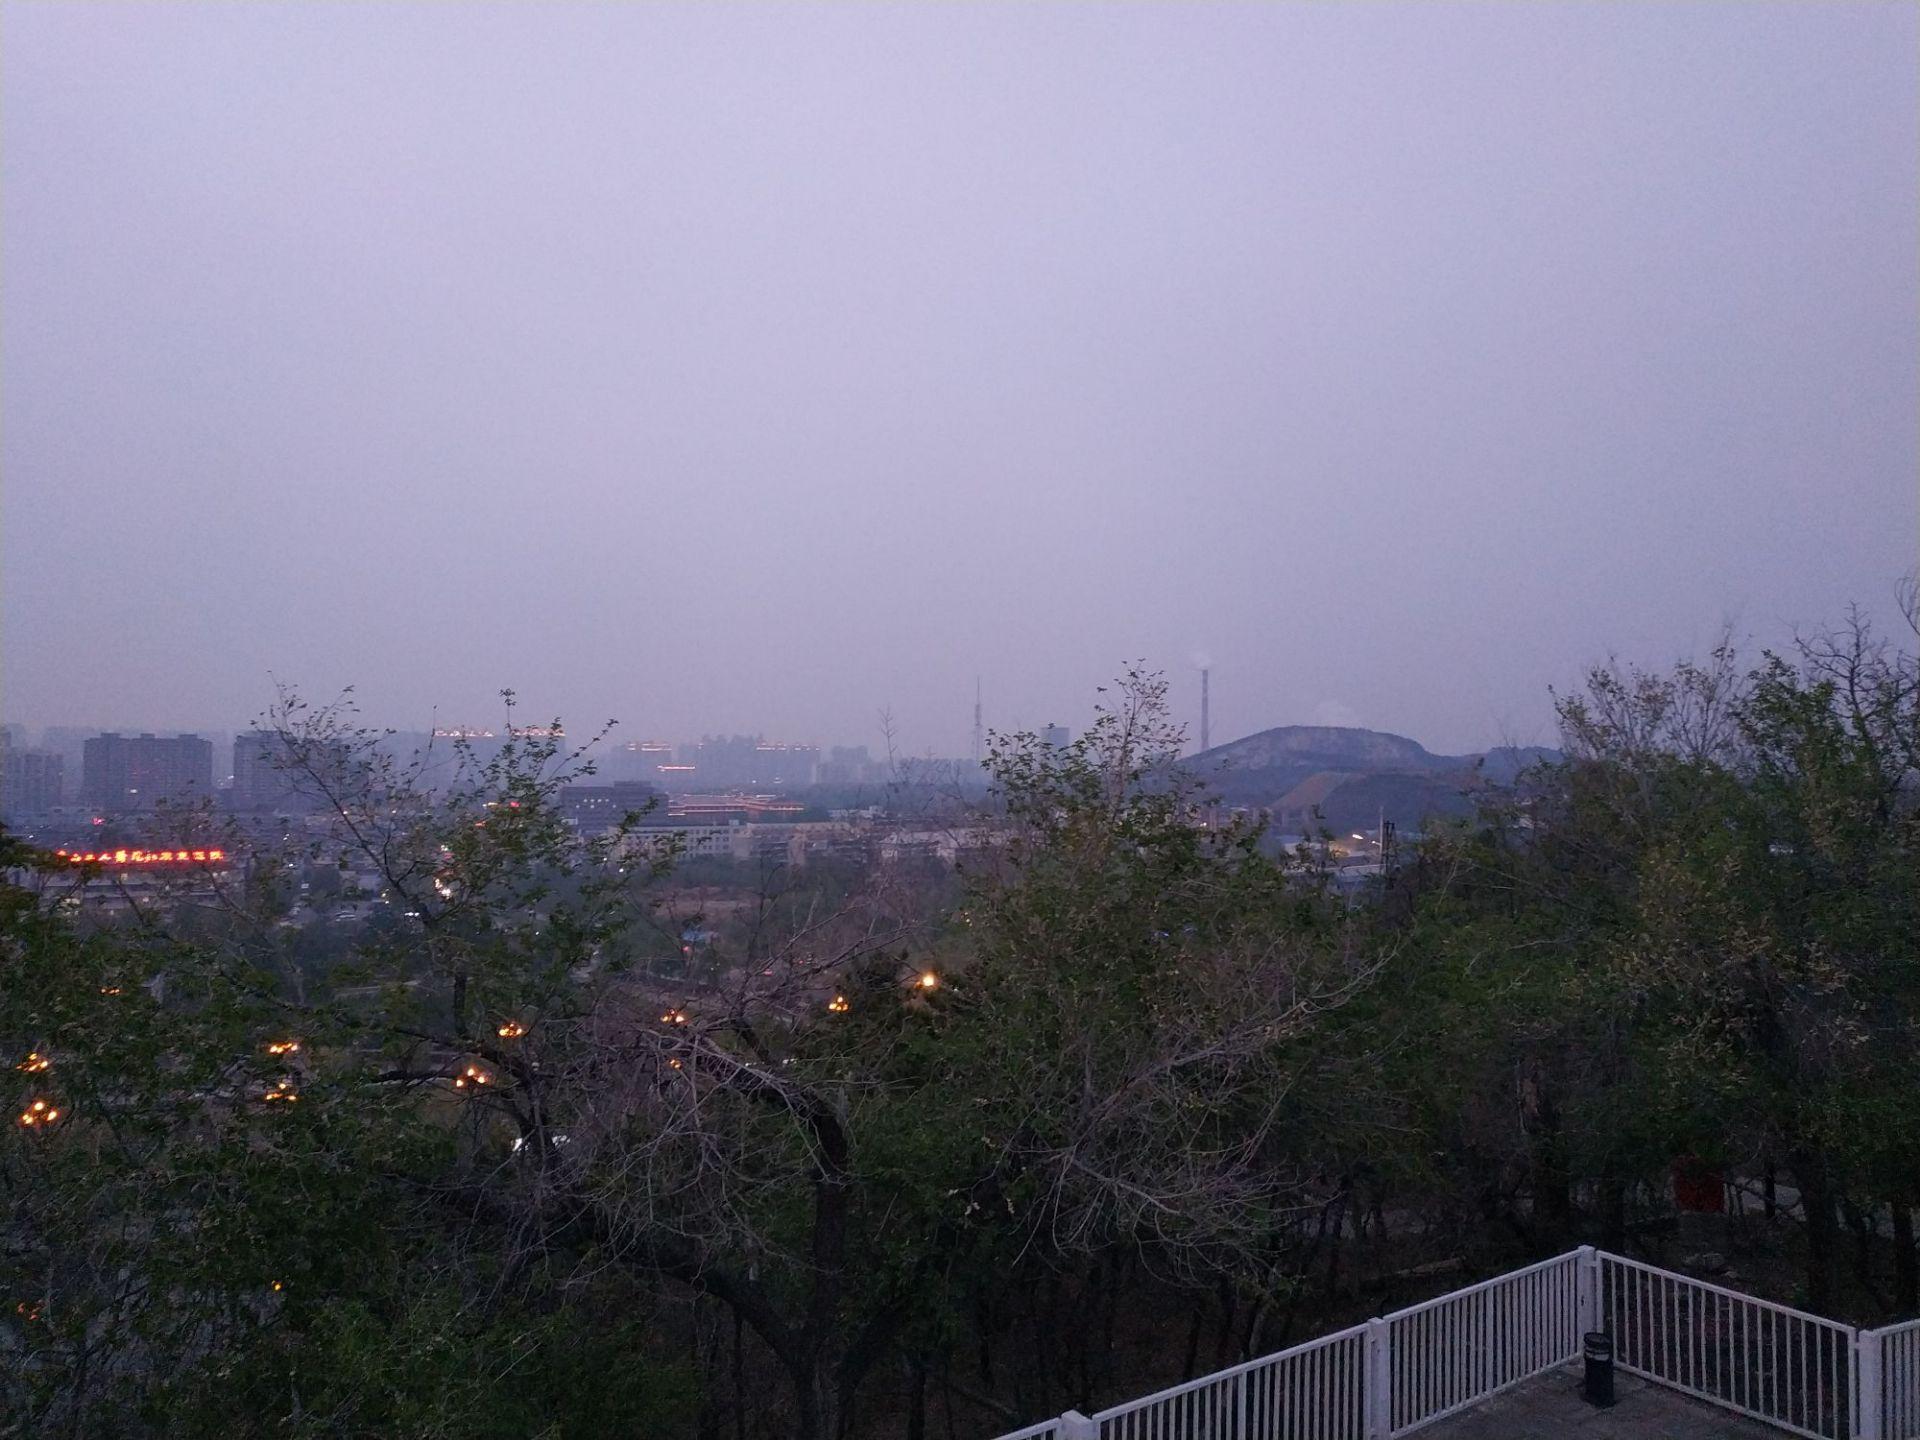 Dachengshan Park